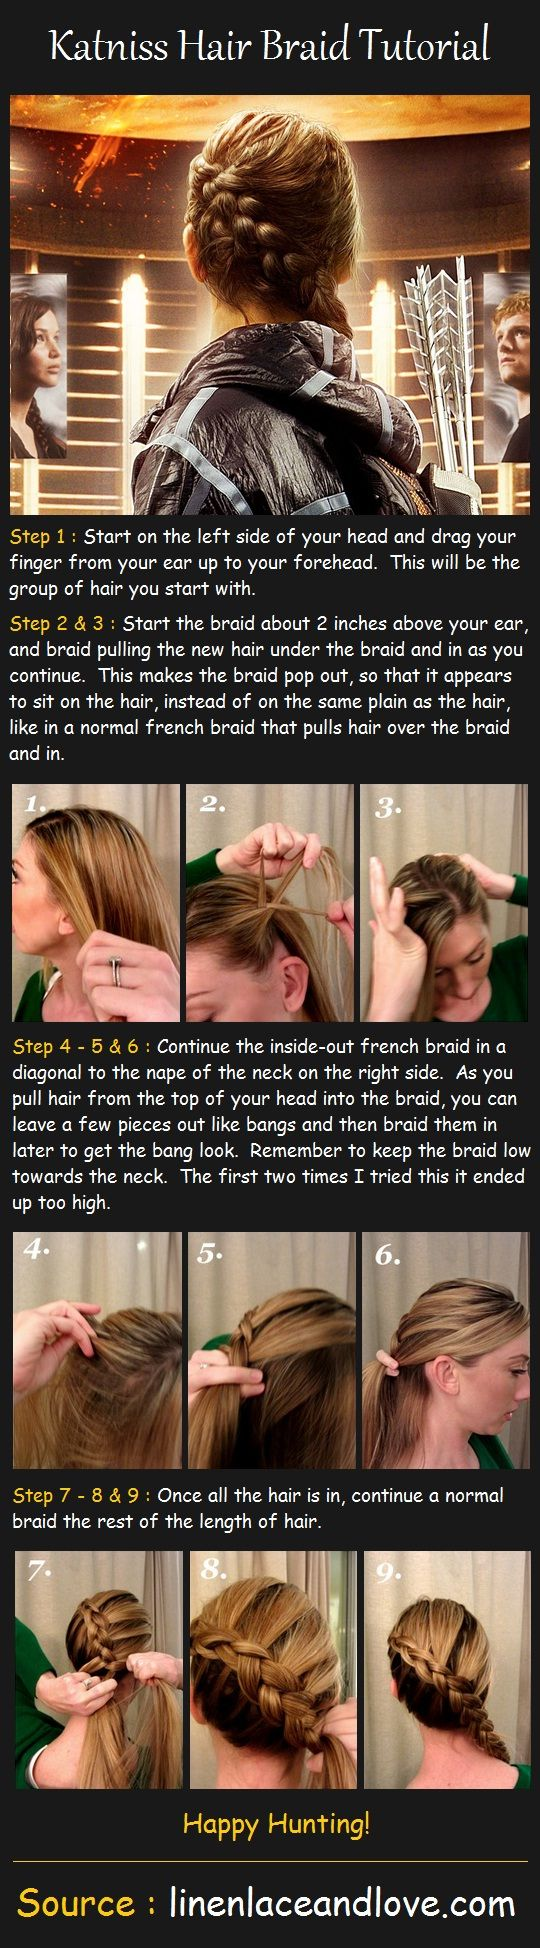 Katniss' braid - do I have enough hair to fake this?